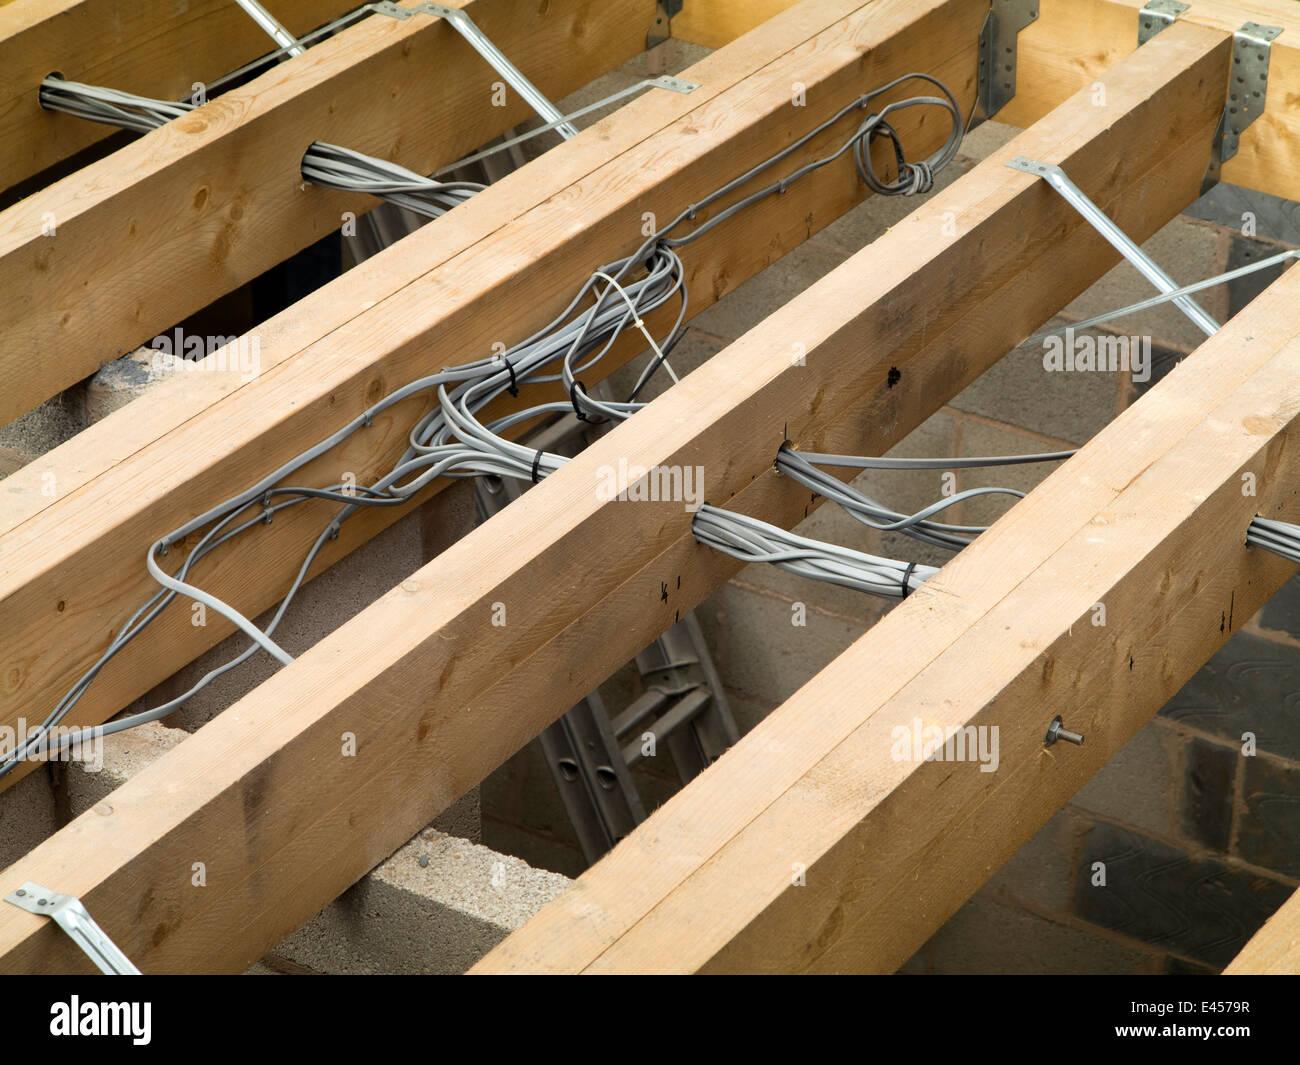 Gut gemocht Elektroinstallation Stockfotos & Elektroinstallation Bilder - Alamy SV09